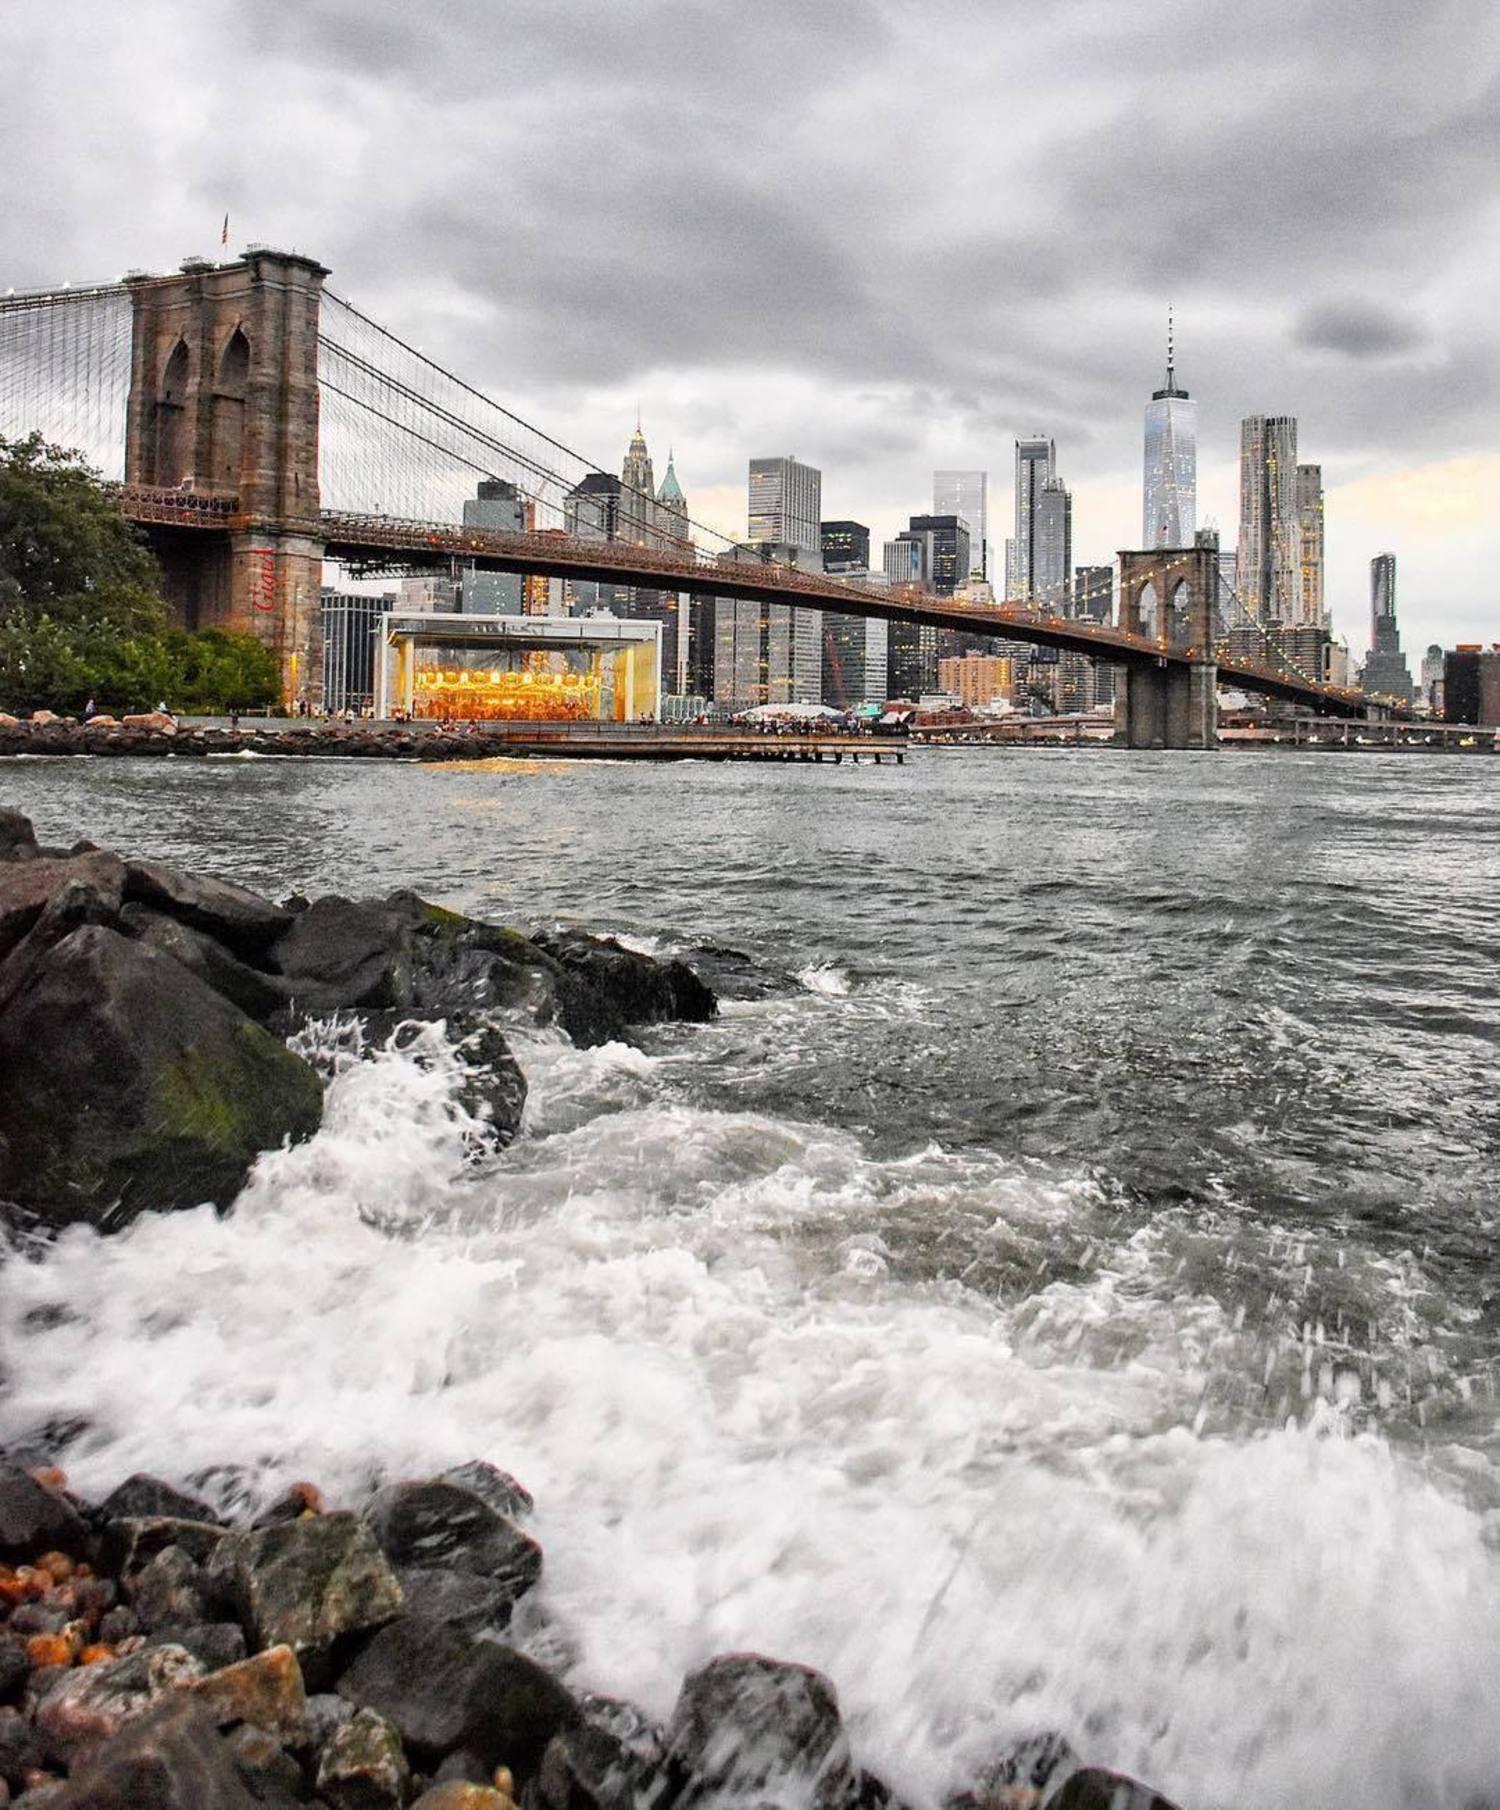 New York, New York. Photo via @gigi.nyc #newyorkcity #newyork #nyc #viewingnyc